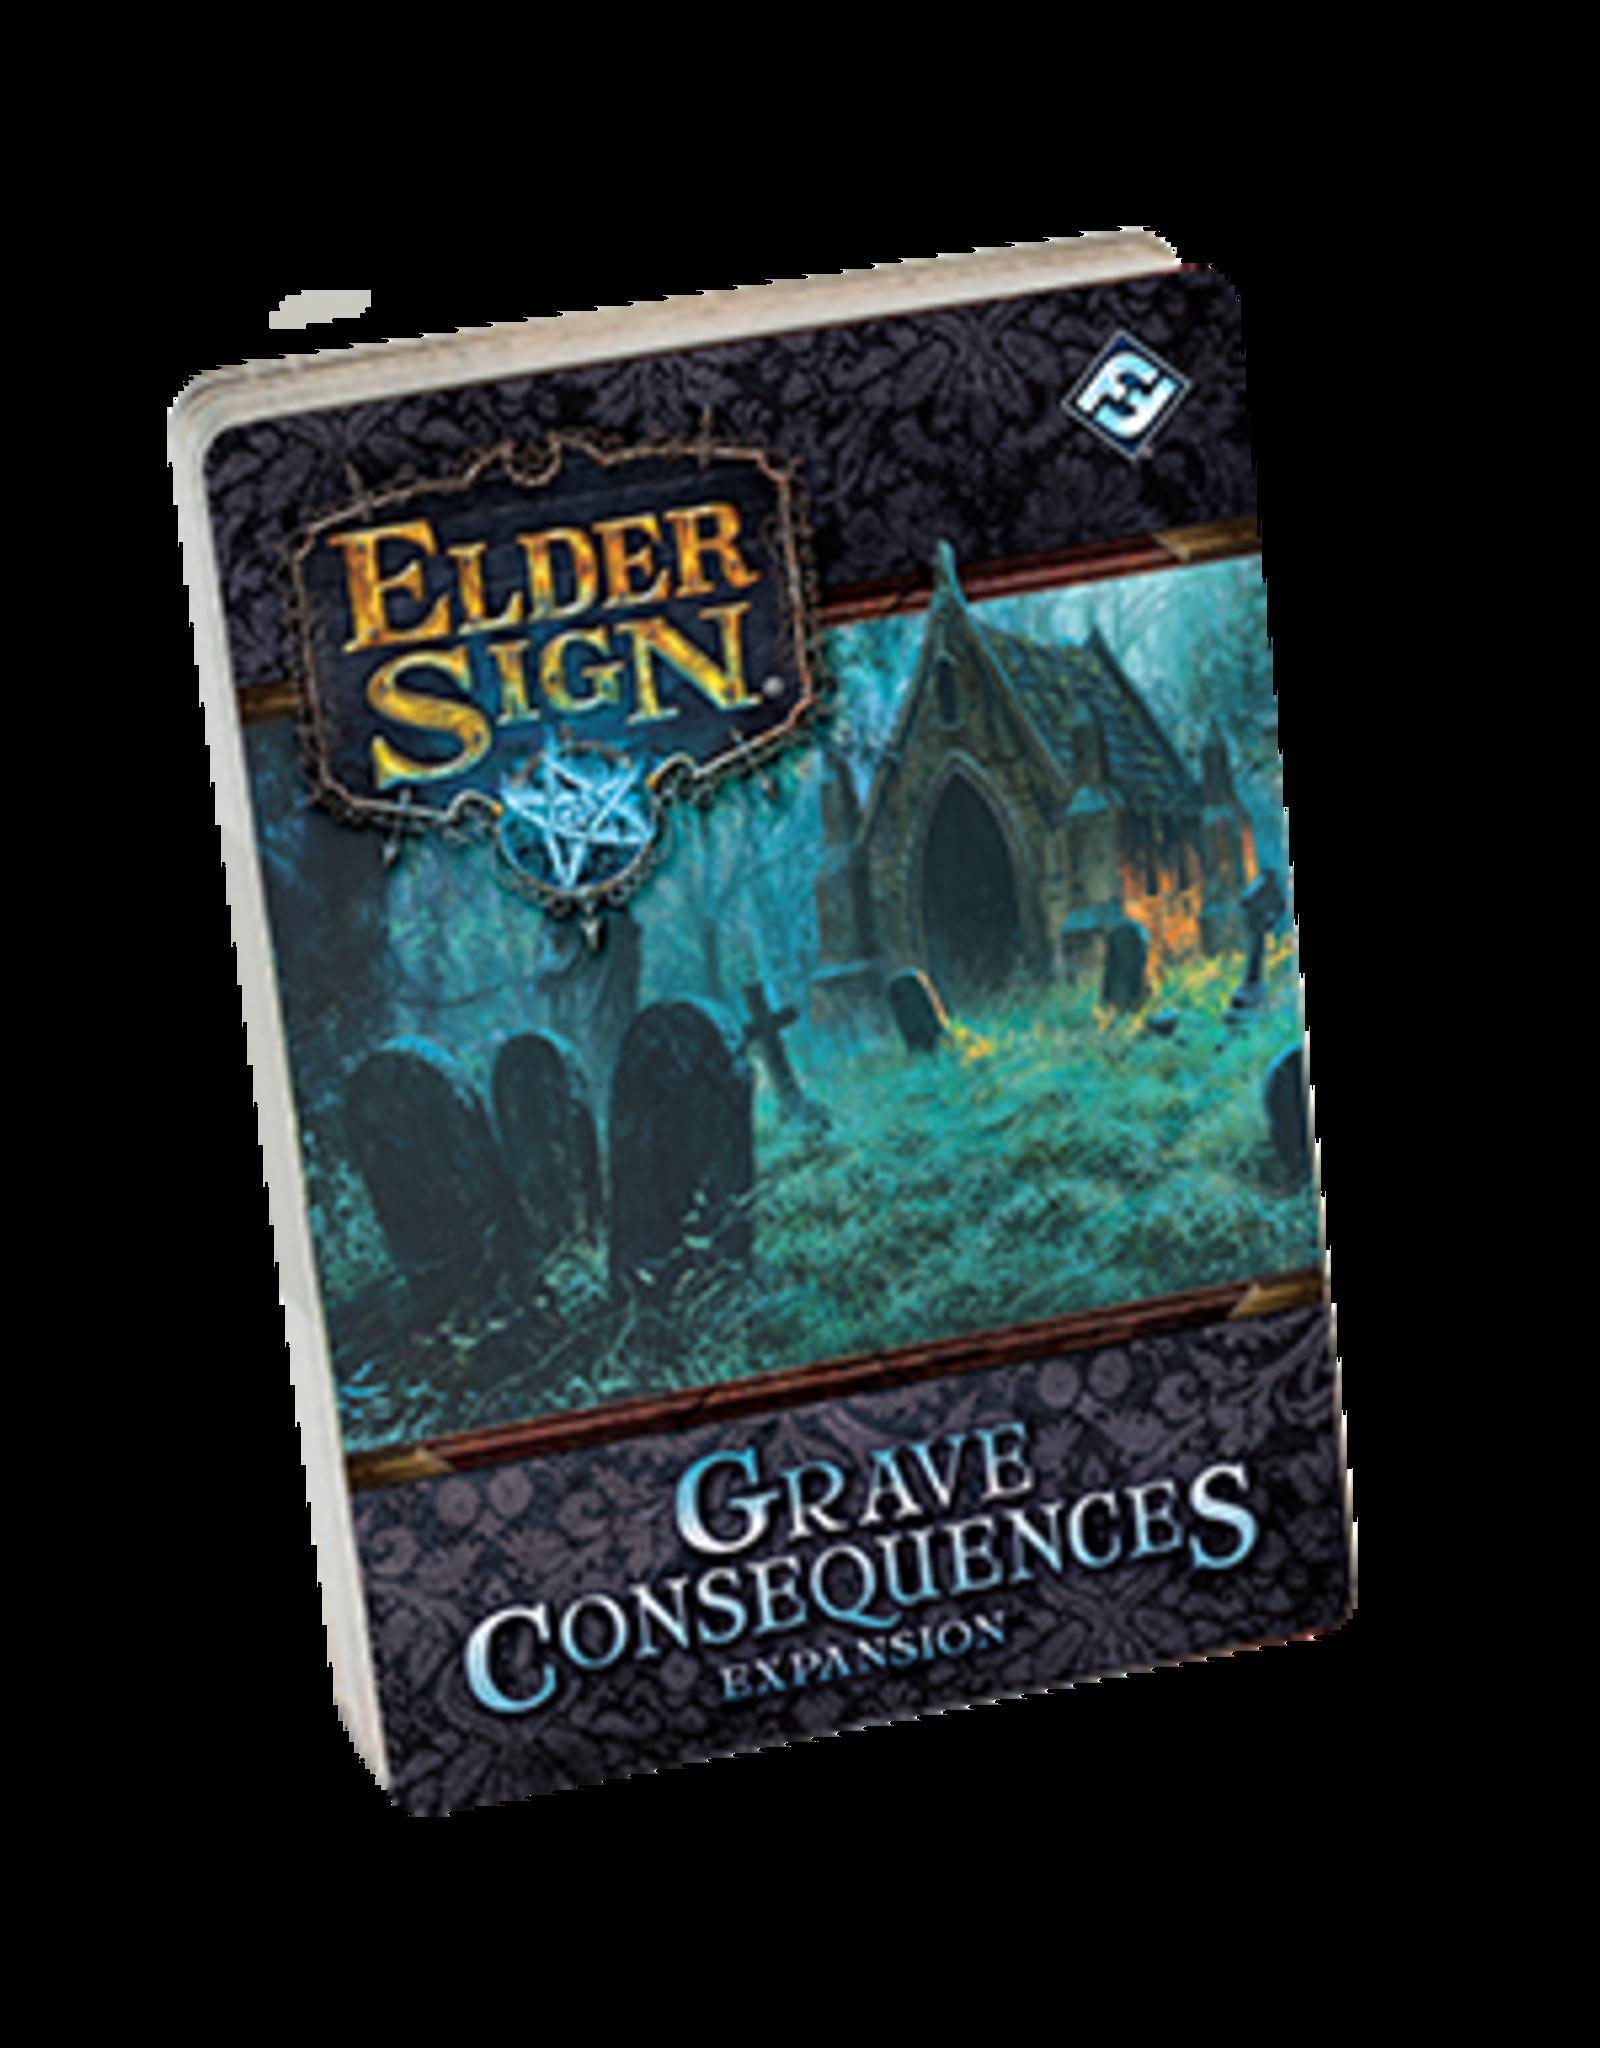 Elder Sign: Grave Consequences Expansion